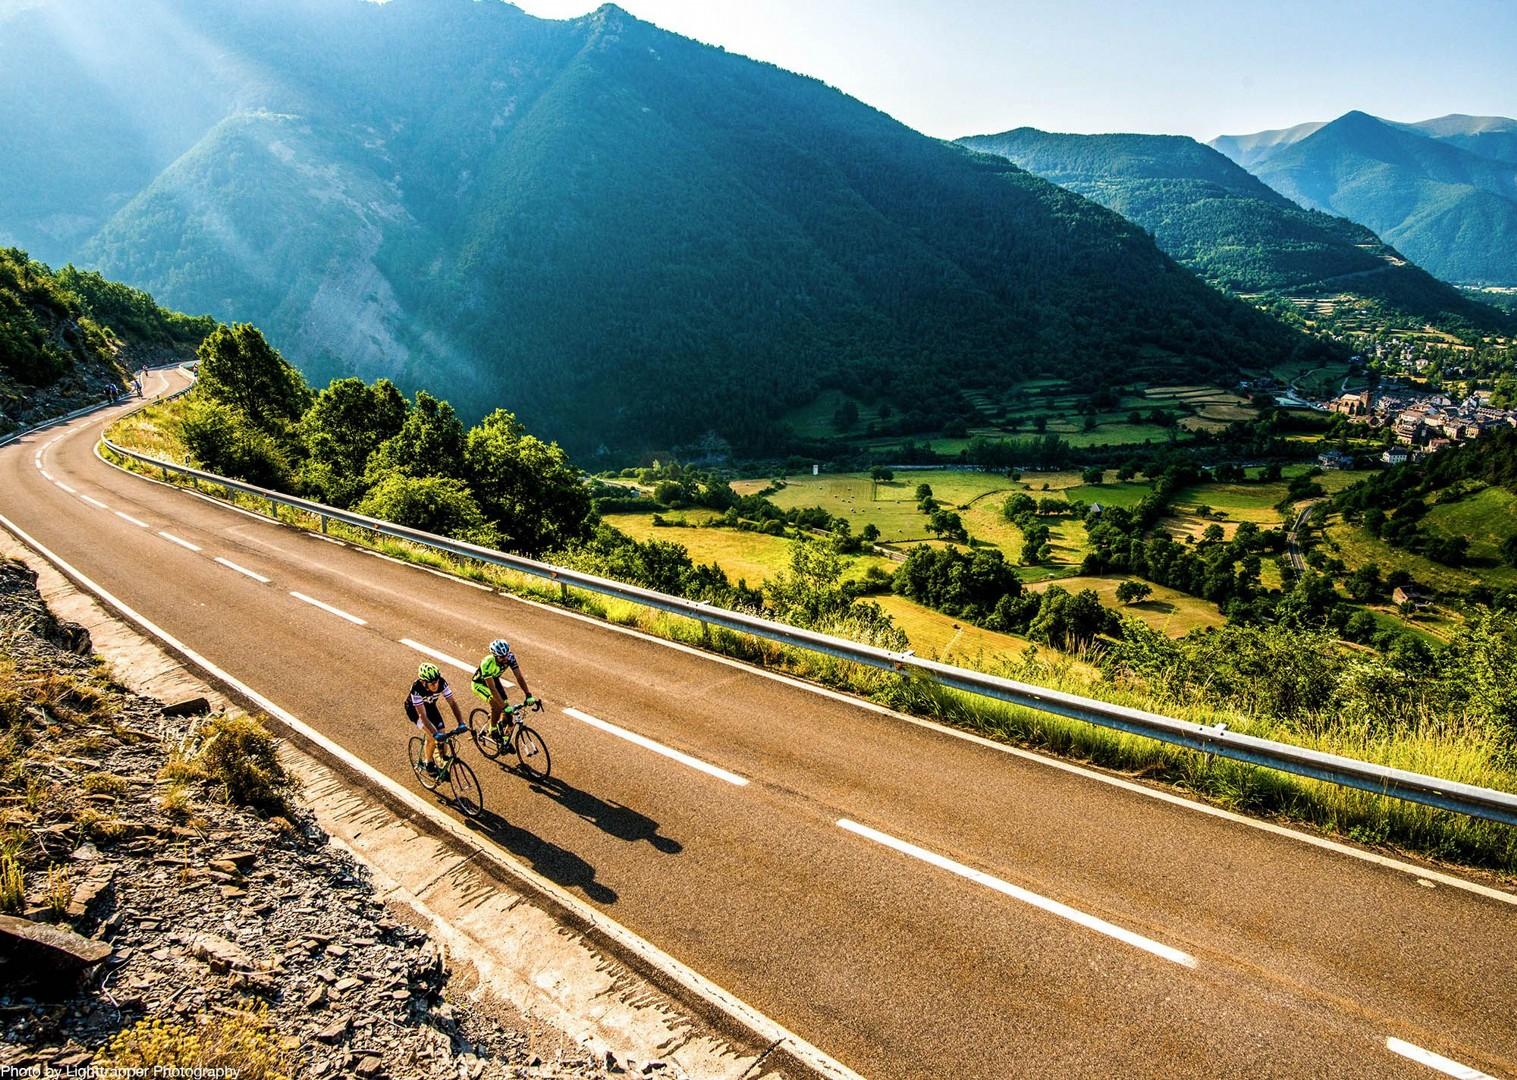 spanish-mountains-pyrenees-coast-to-coast-saddle-skedaddle-cycling-holiday.jpg - NEW! Spain - Spanish Pyrenees Coast to Coast - Road Cycling